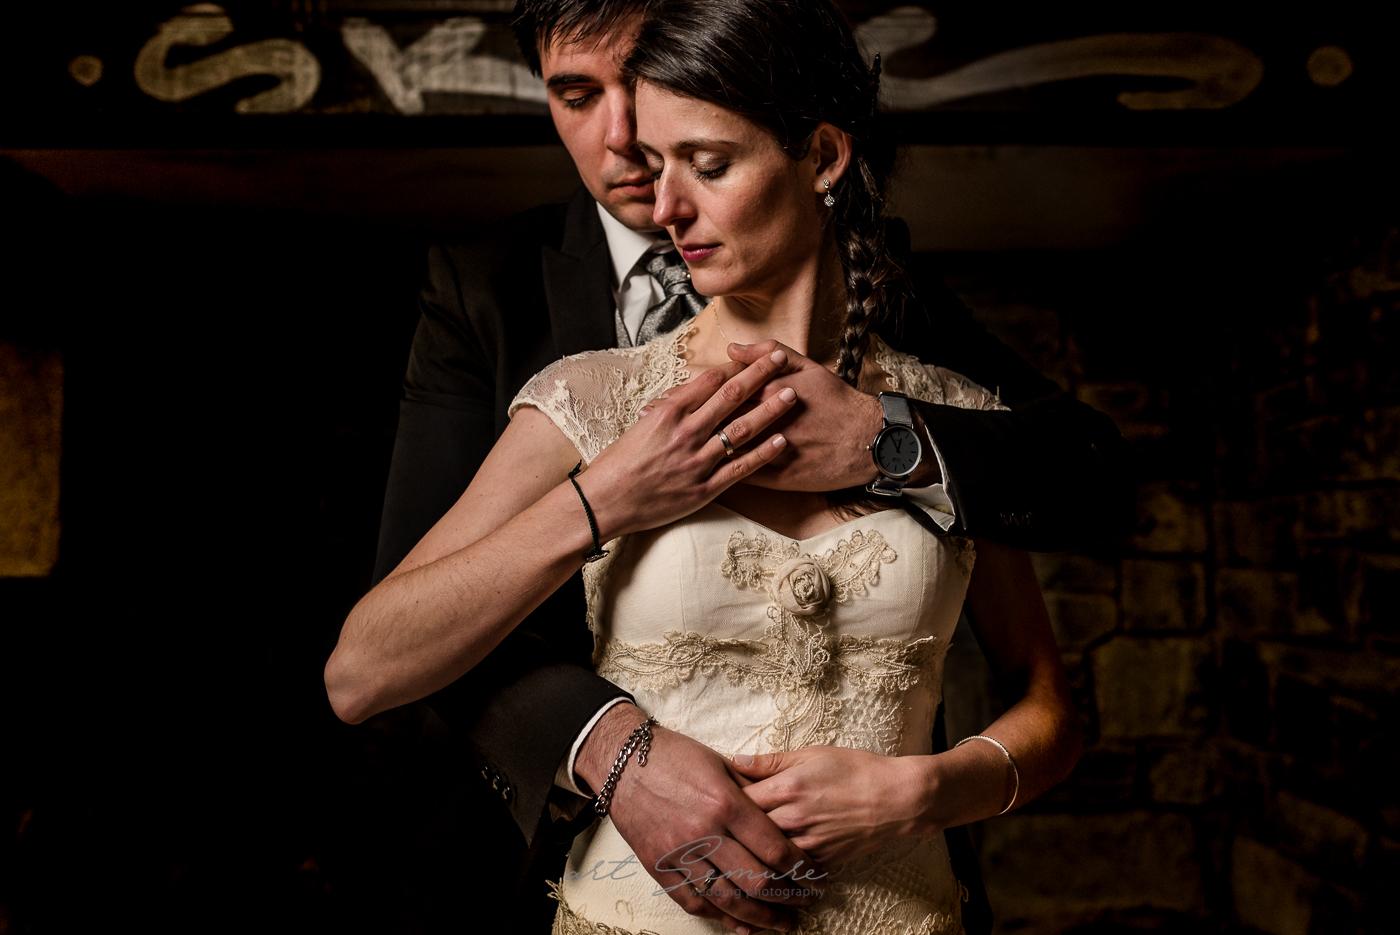 fotografo boda emotiva zamora salto de castro 23_